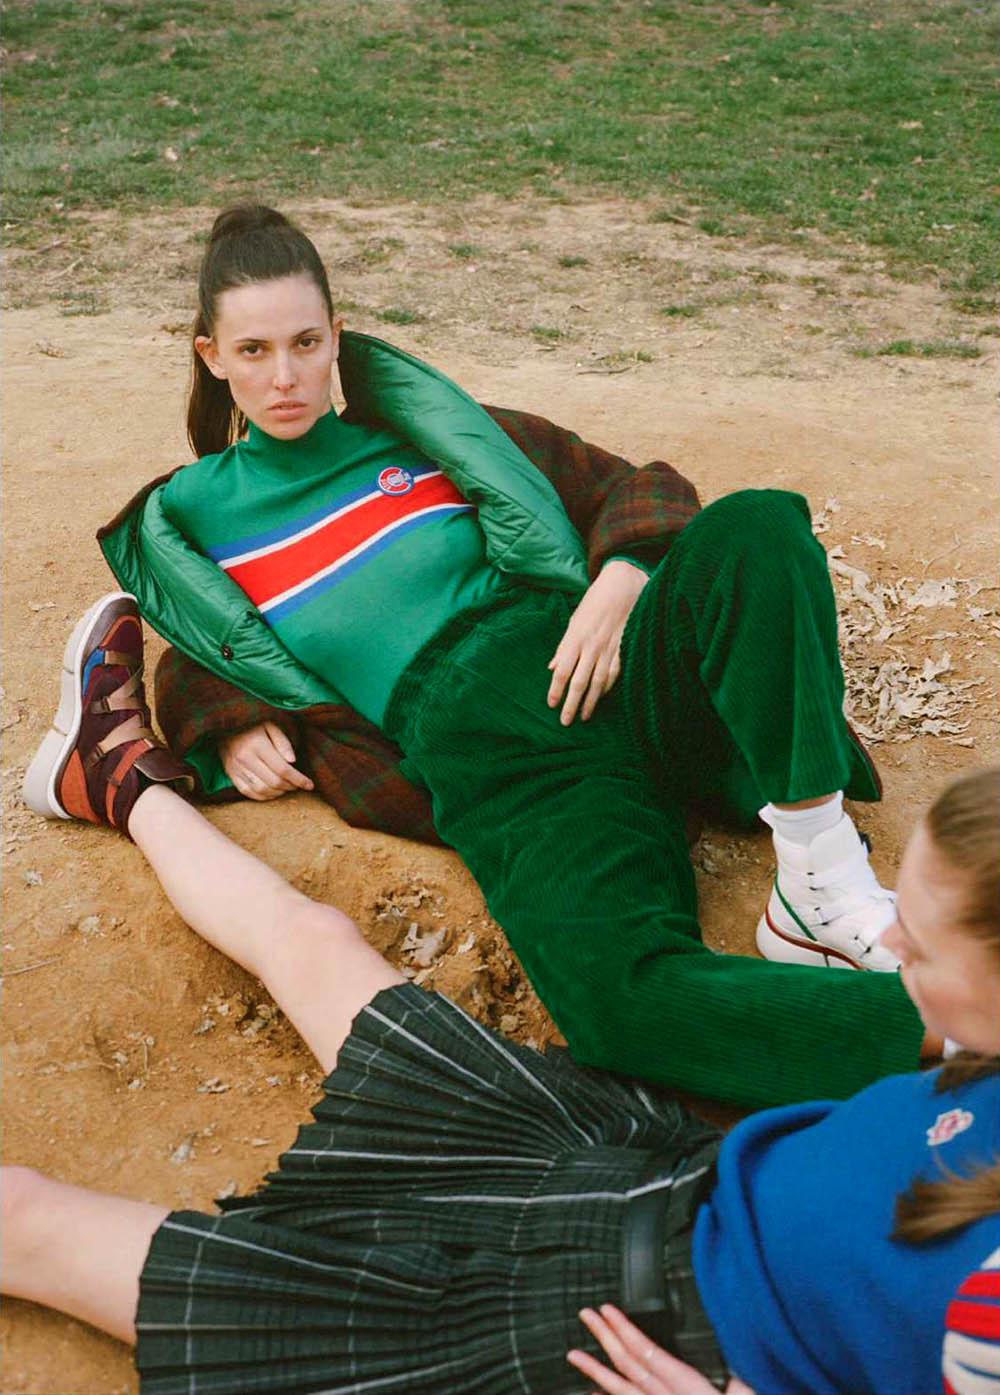 Lauren de Graaf and Ruby Aldridge by Rebekah Campbell for Elle UK July 2018